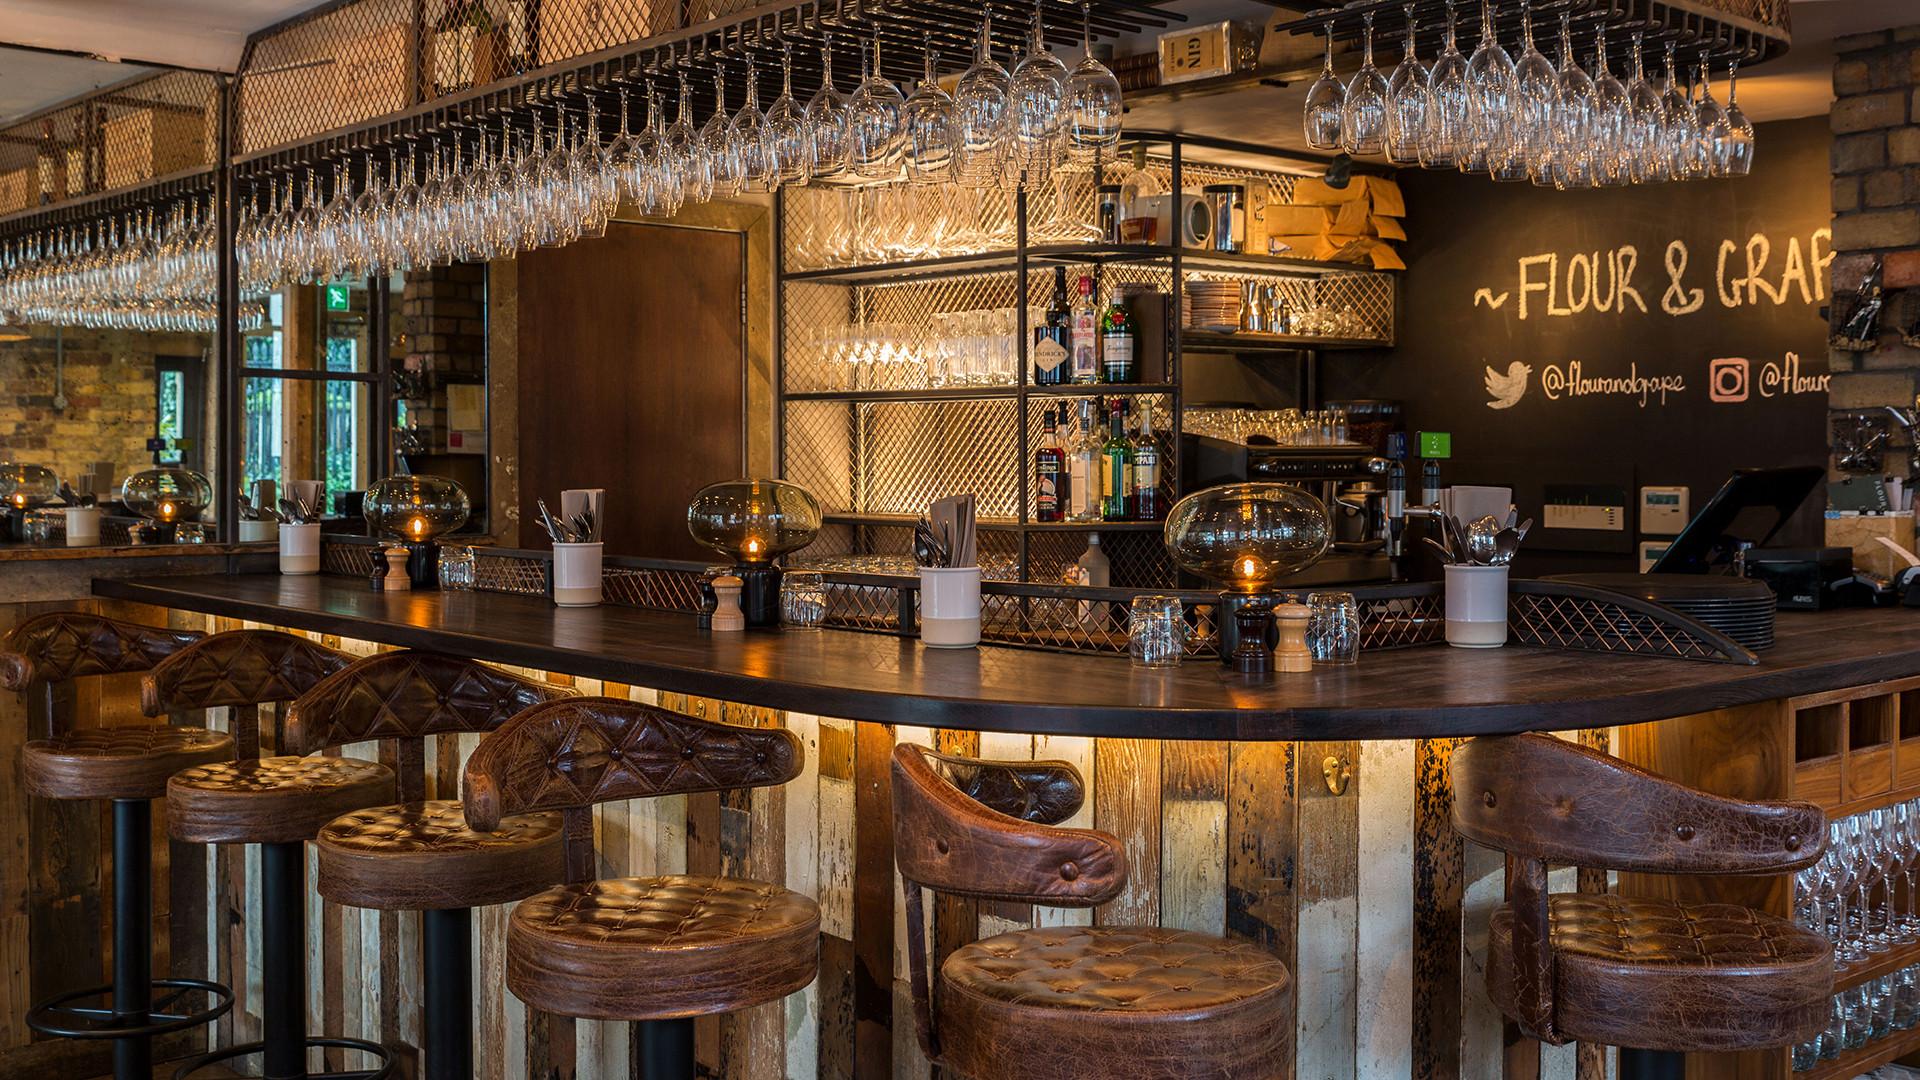 Best pasta restaurants in London – Flour & Grape